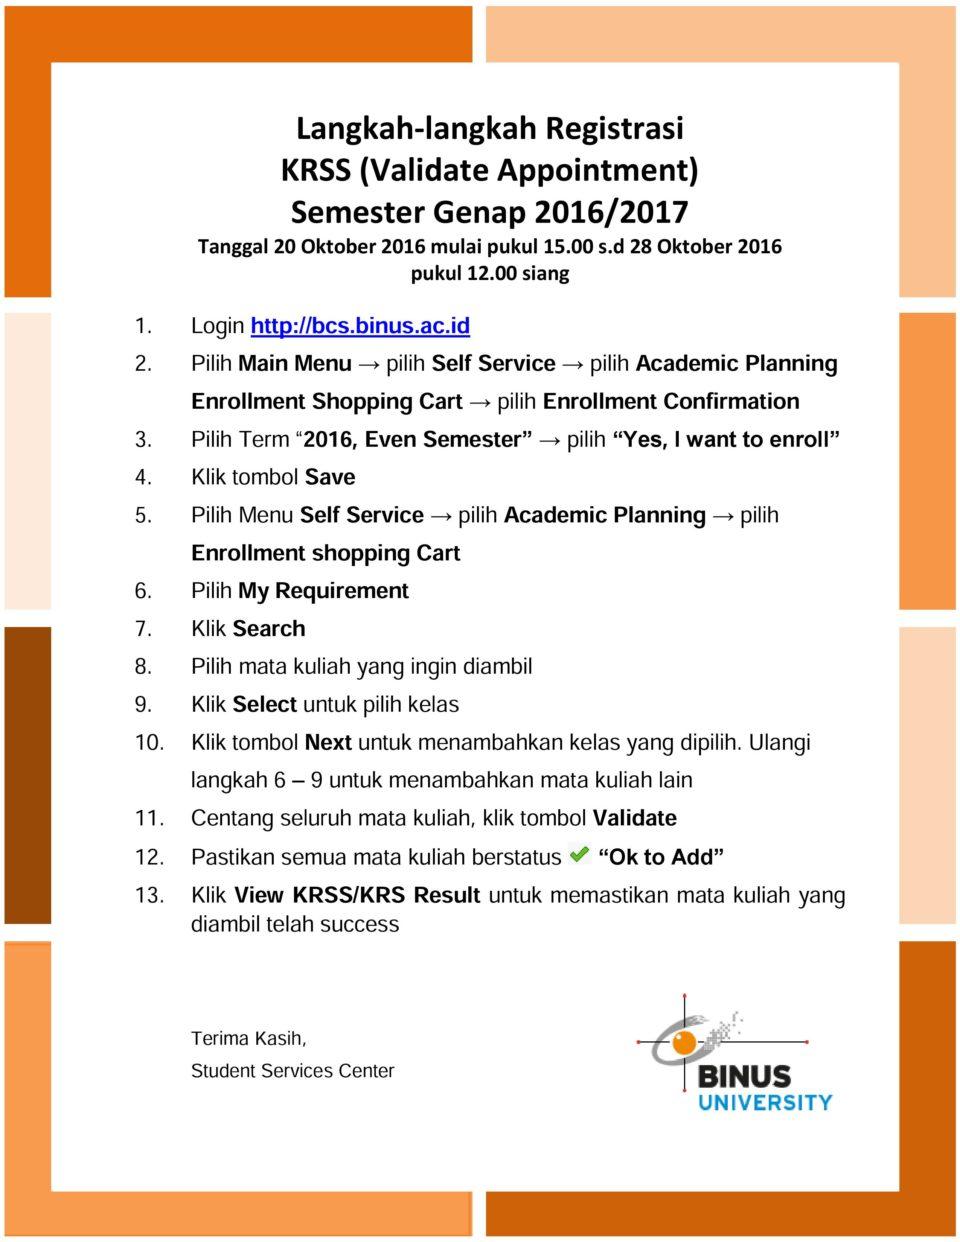 Langkah-langkah Registrasi KRSS (Validate Appointment) Semester Genap 2016/207